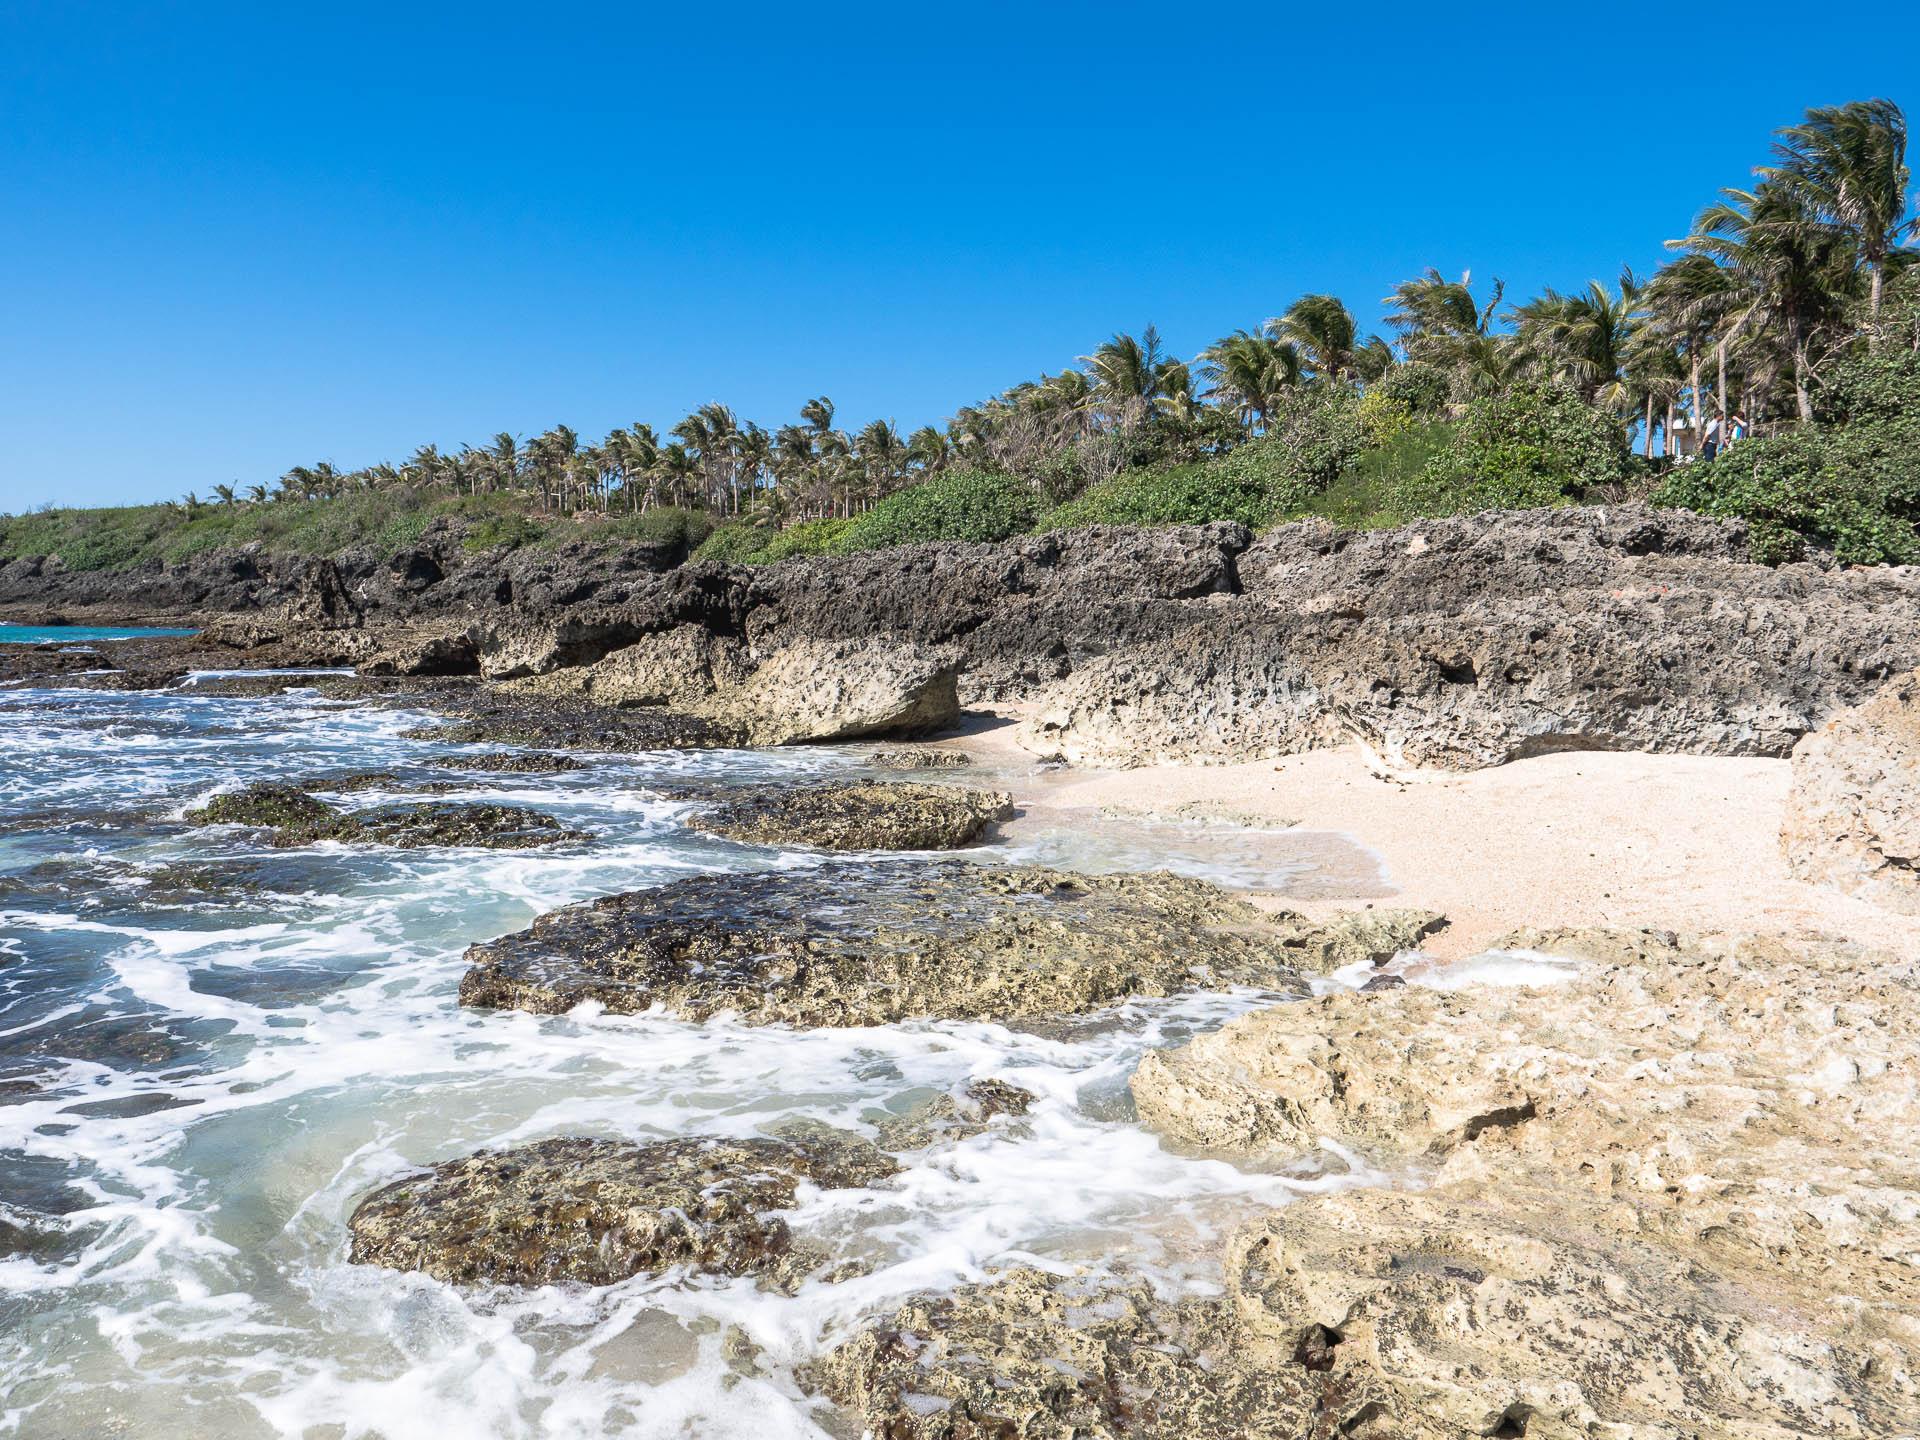 baisha mer ensemble - Les globe blogueurs - blog voyage nature